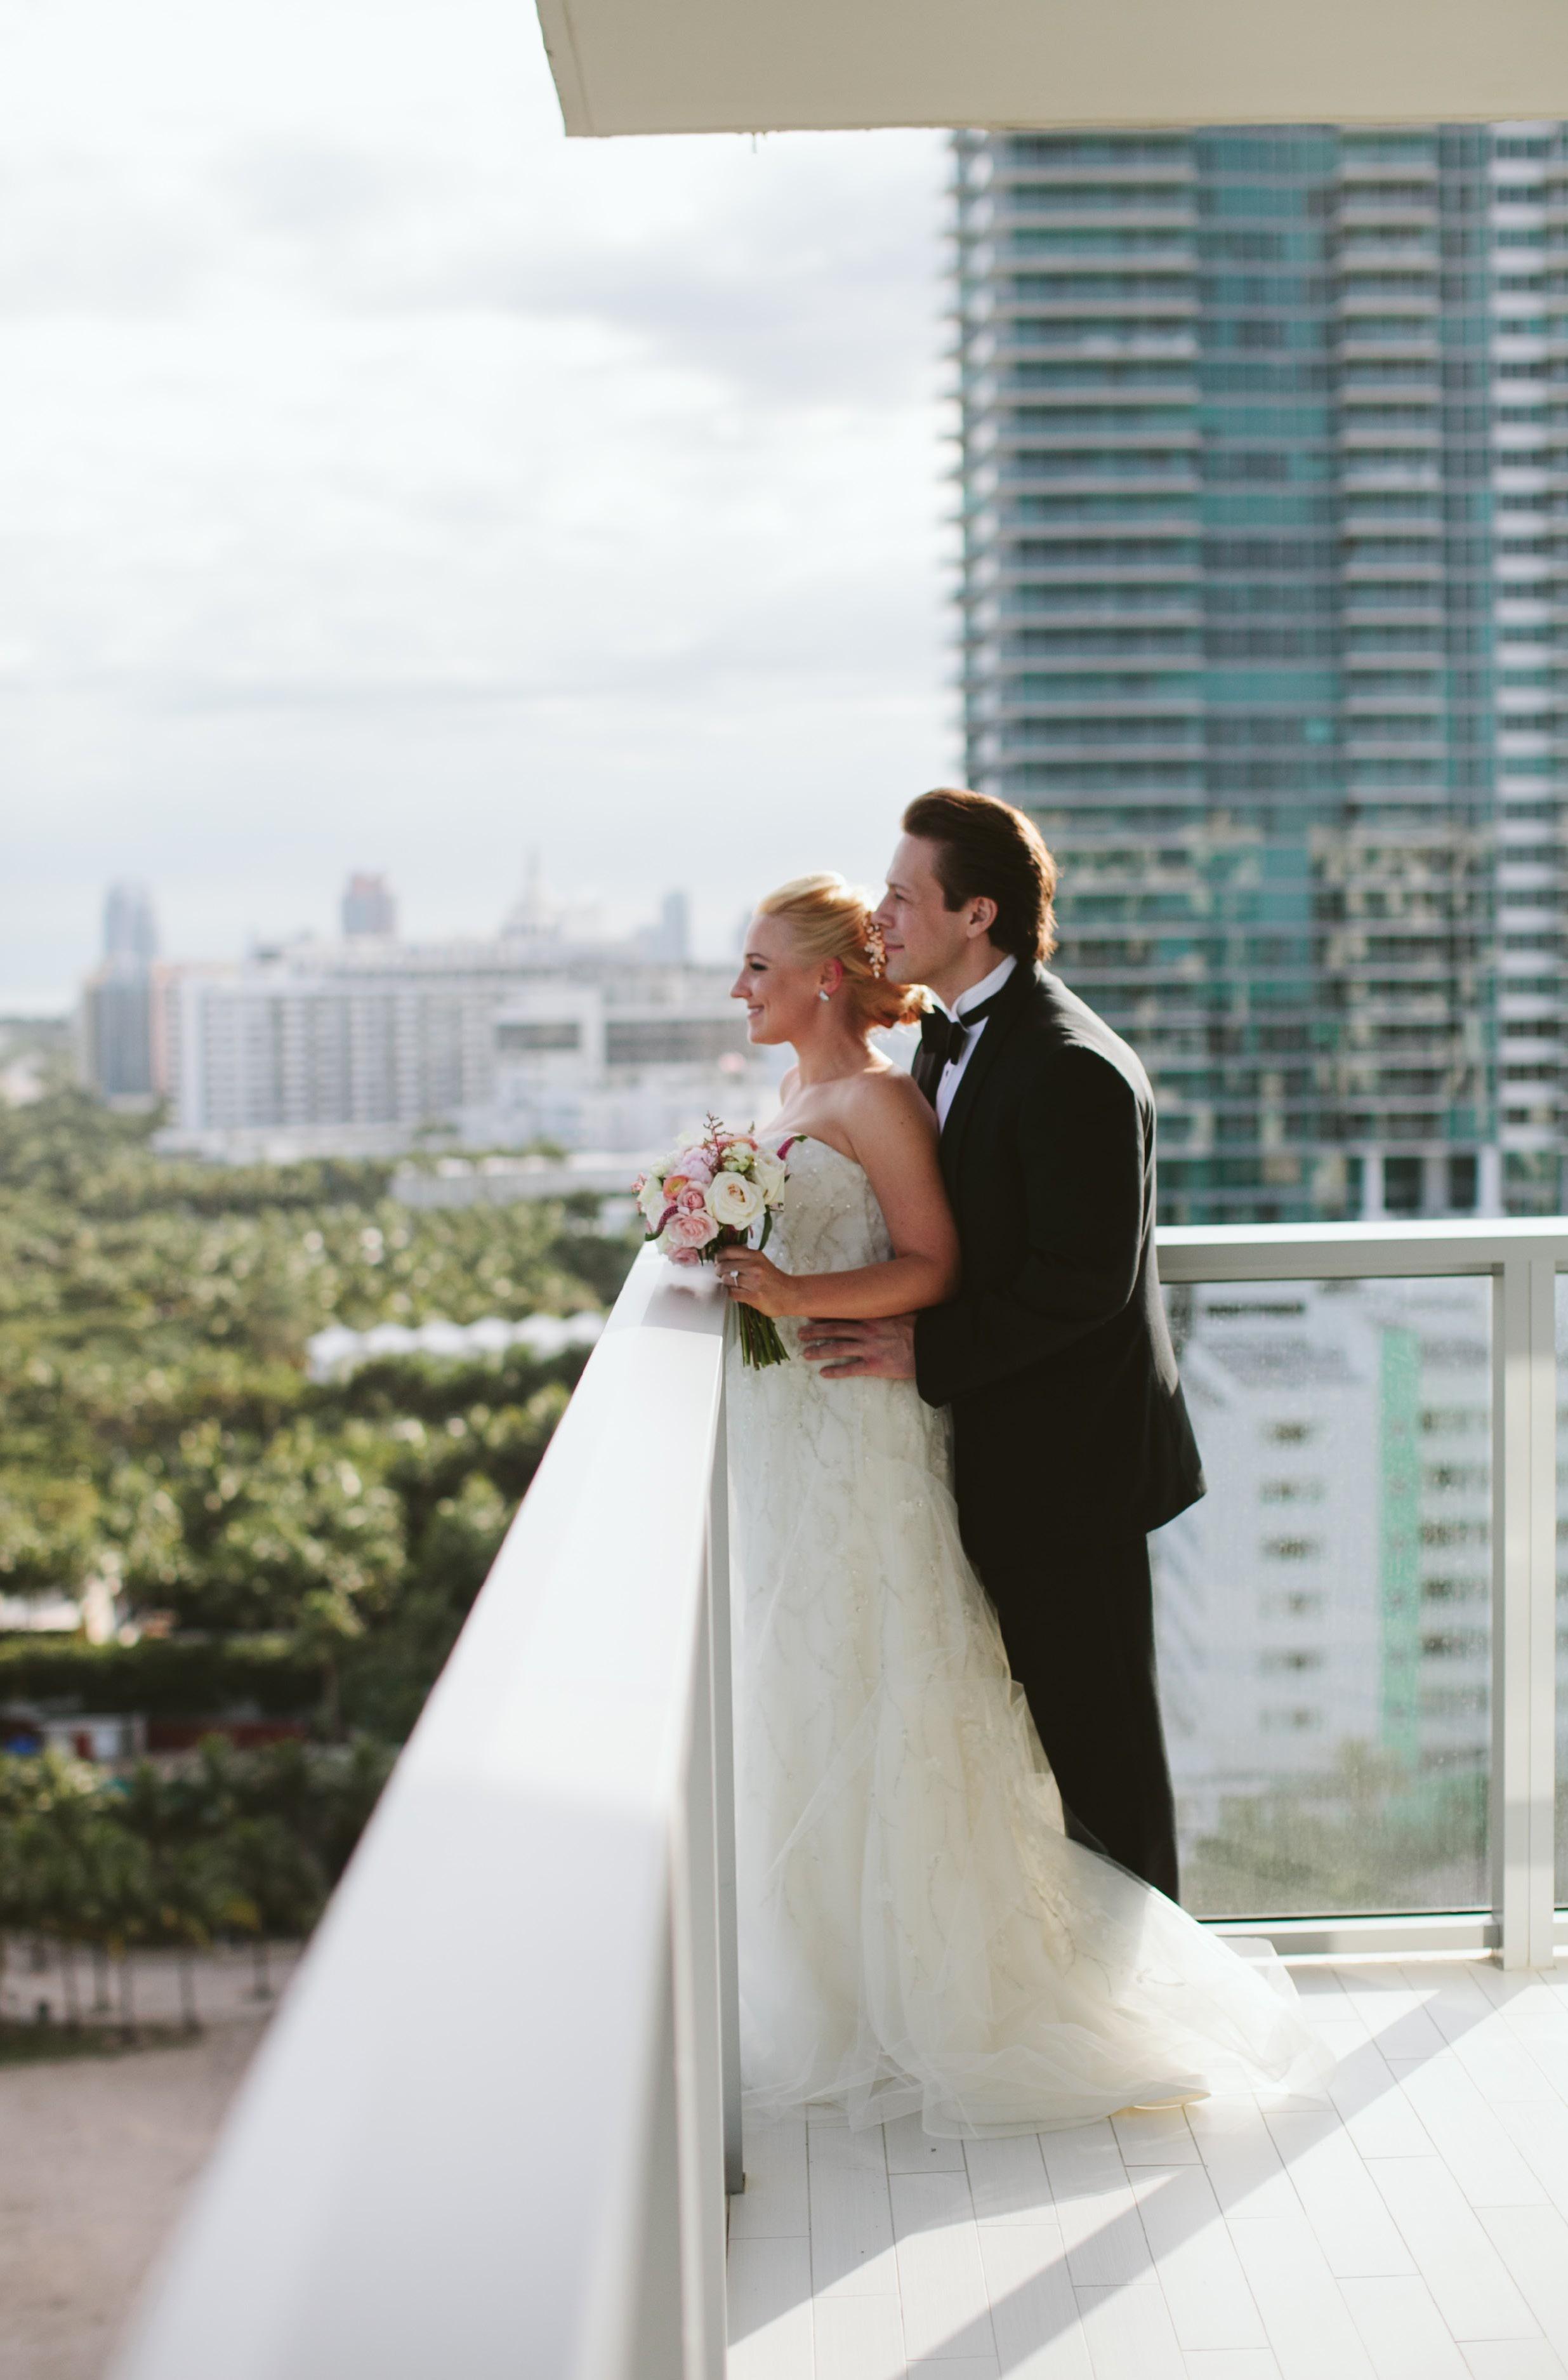 Jackie + Joe Wedding at the W South Beach Miami37.jpg